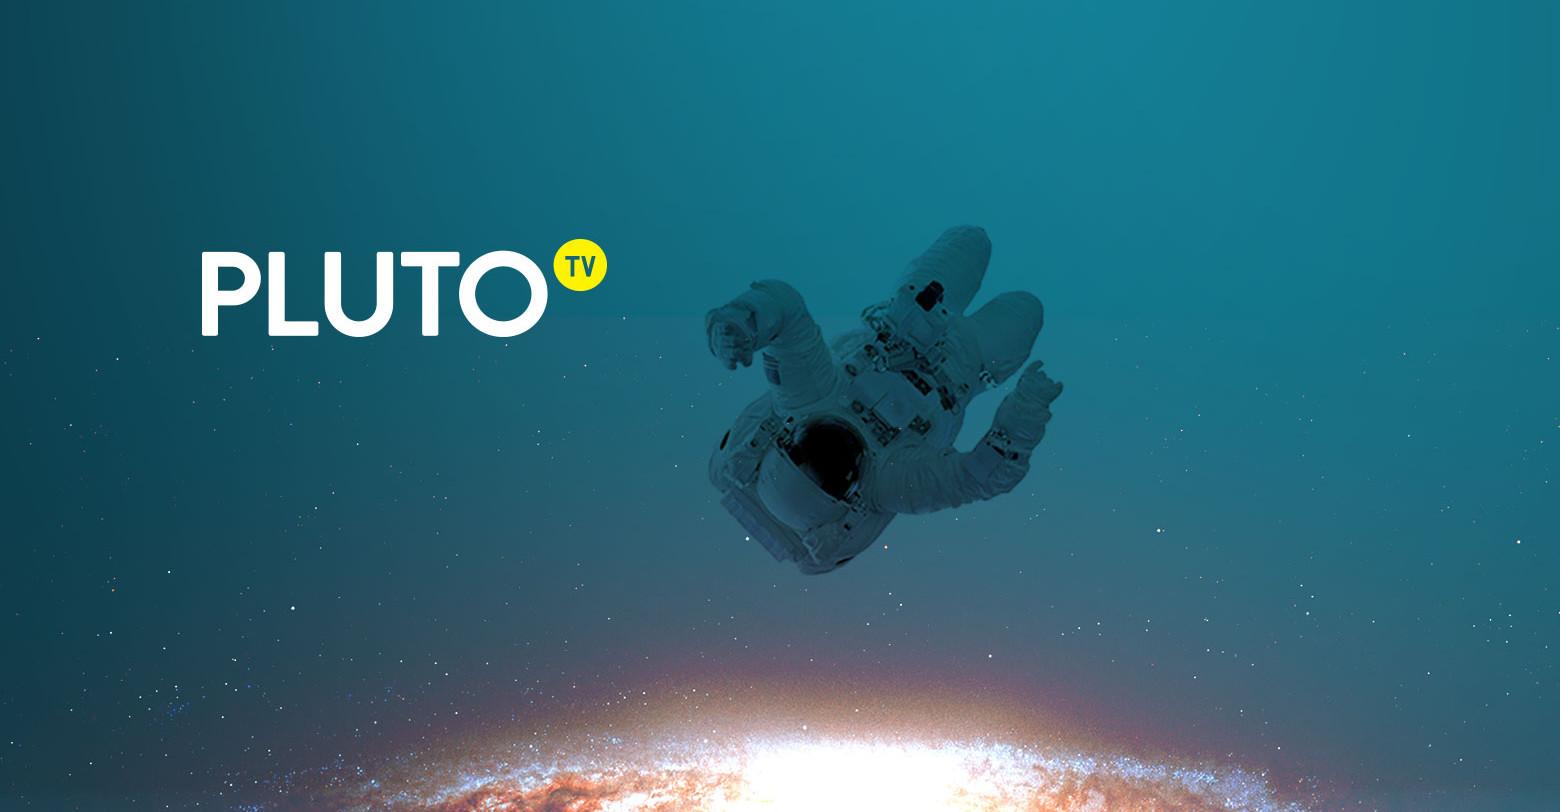 Pluto TV promo image of astronaut in space